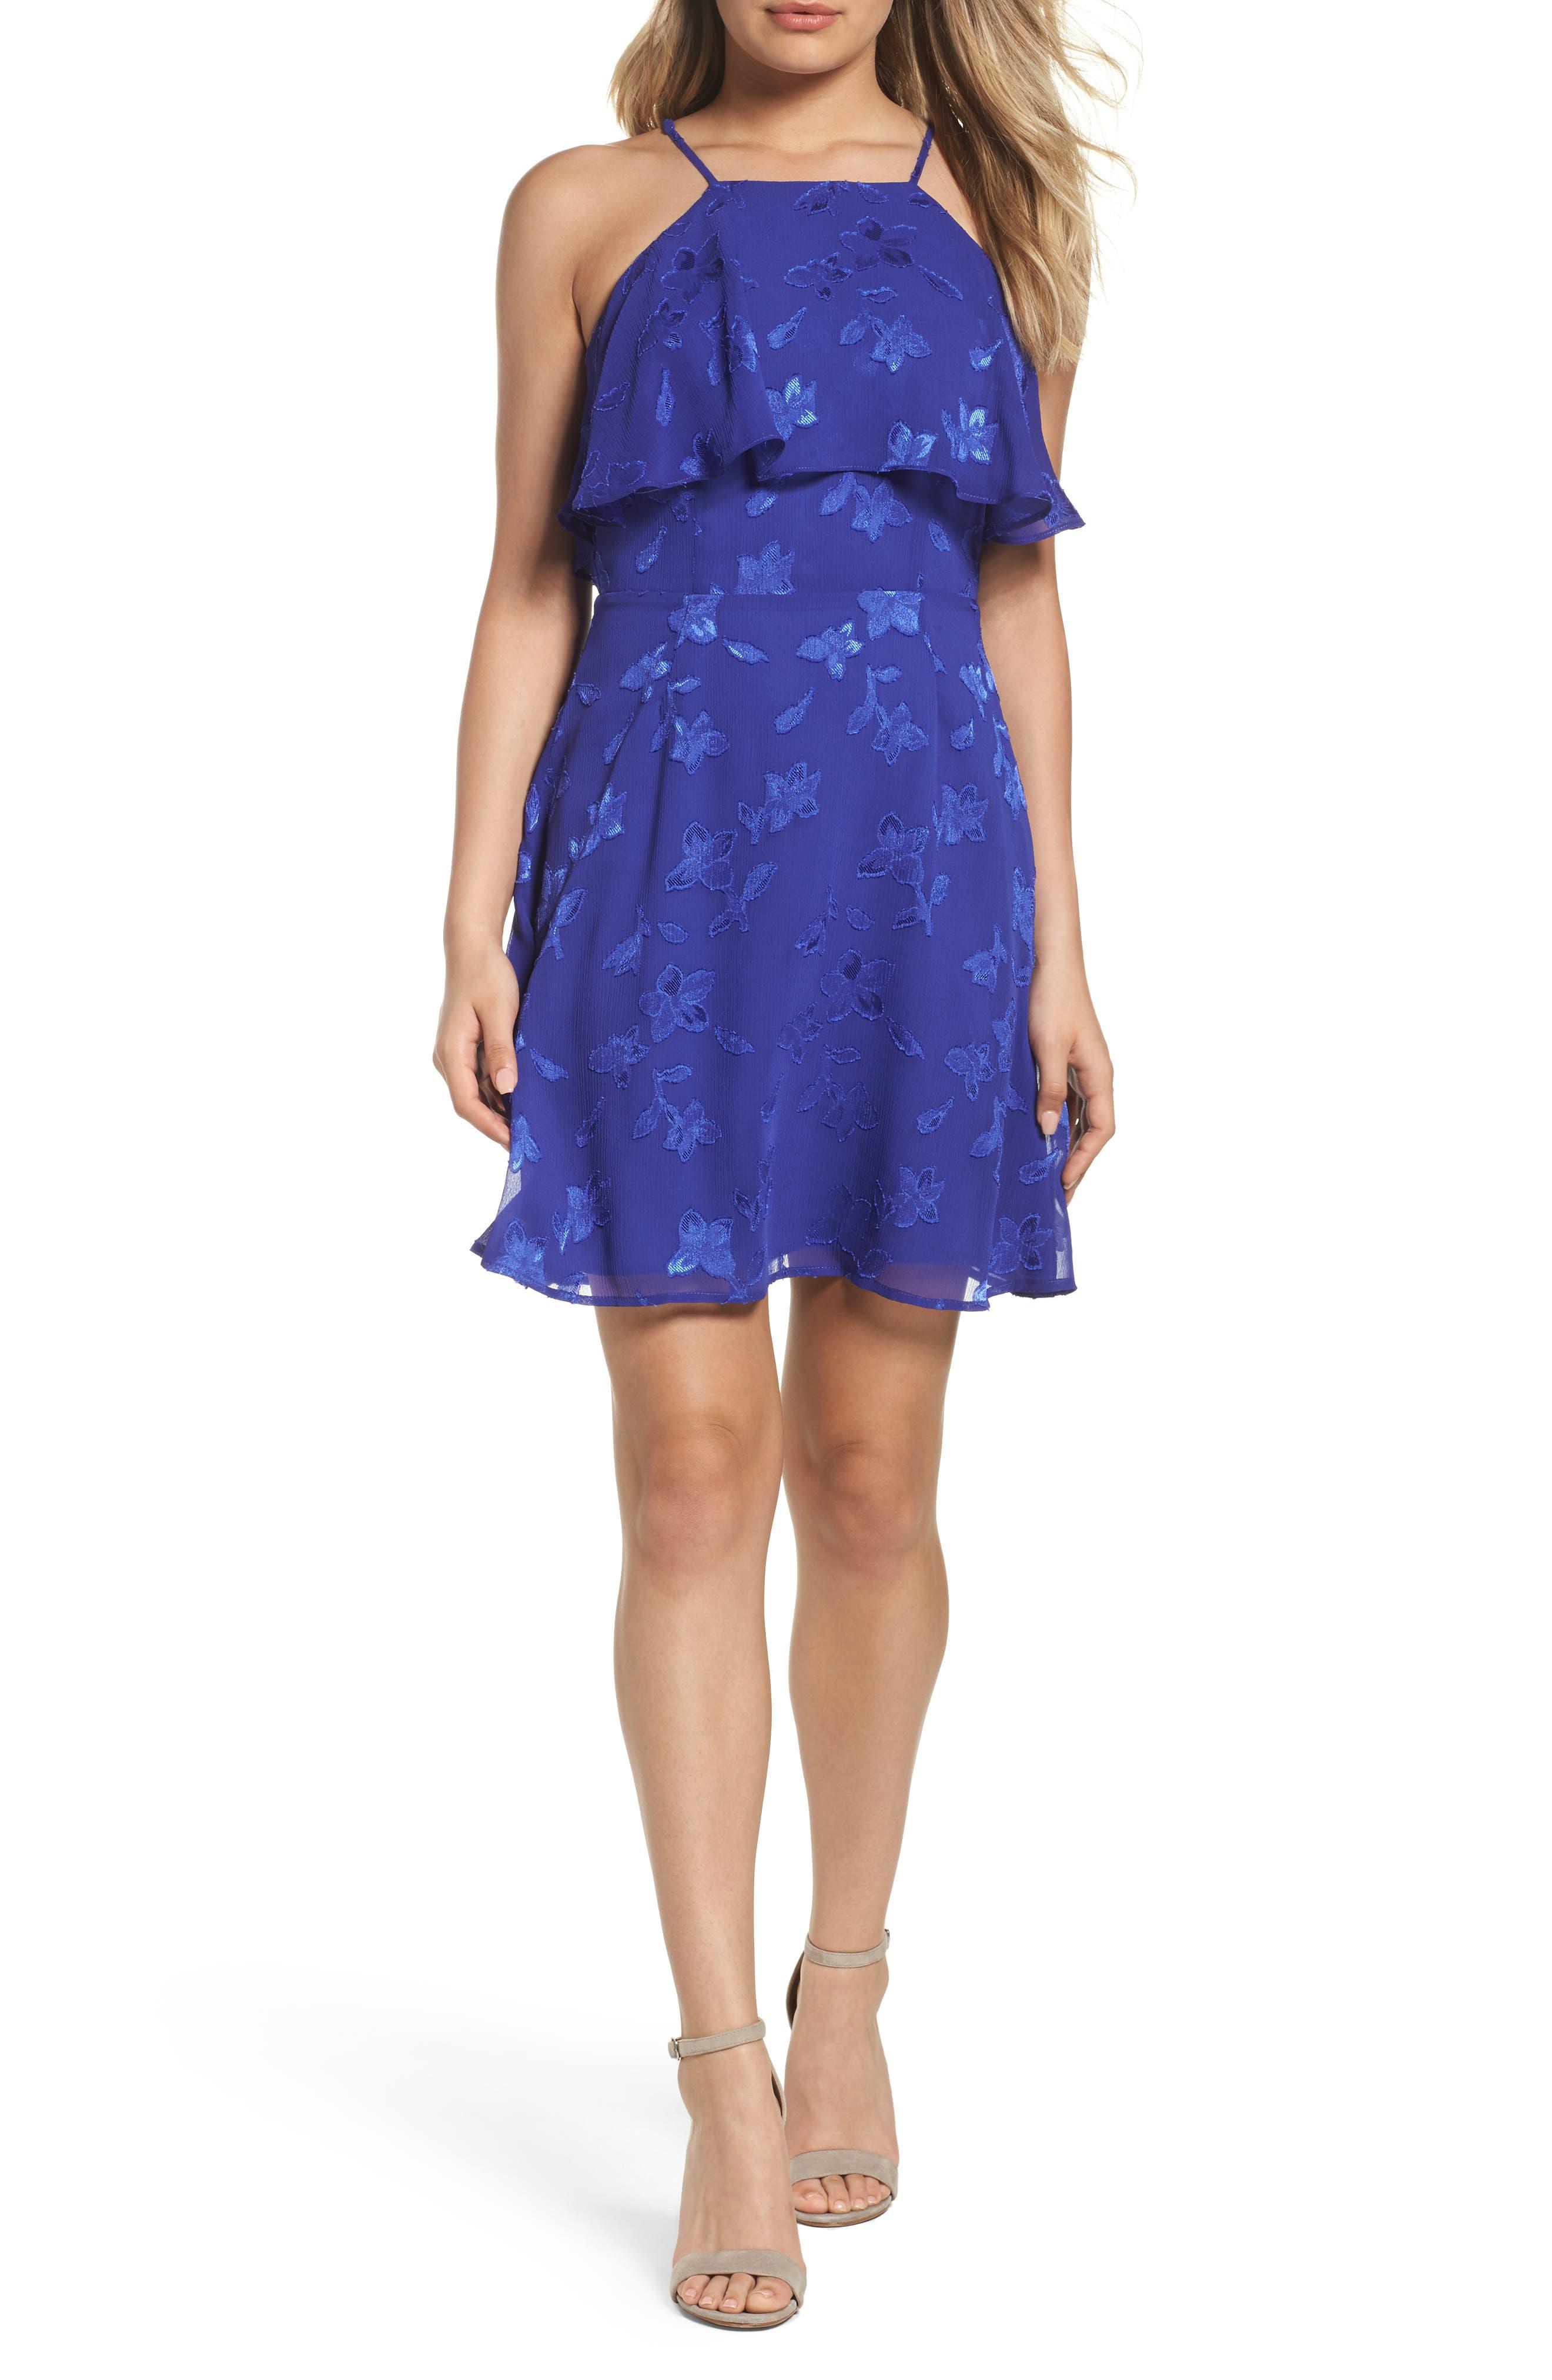 Alternate Image 1 Selected - 19 Cooper Jacquard Flower Popover Dress